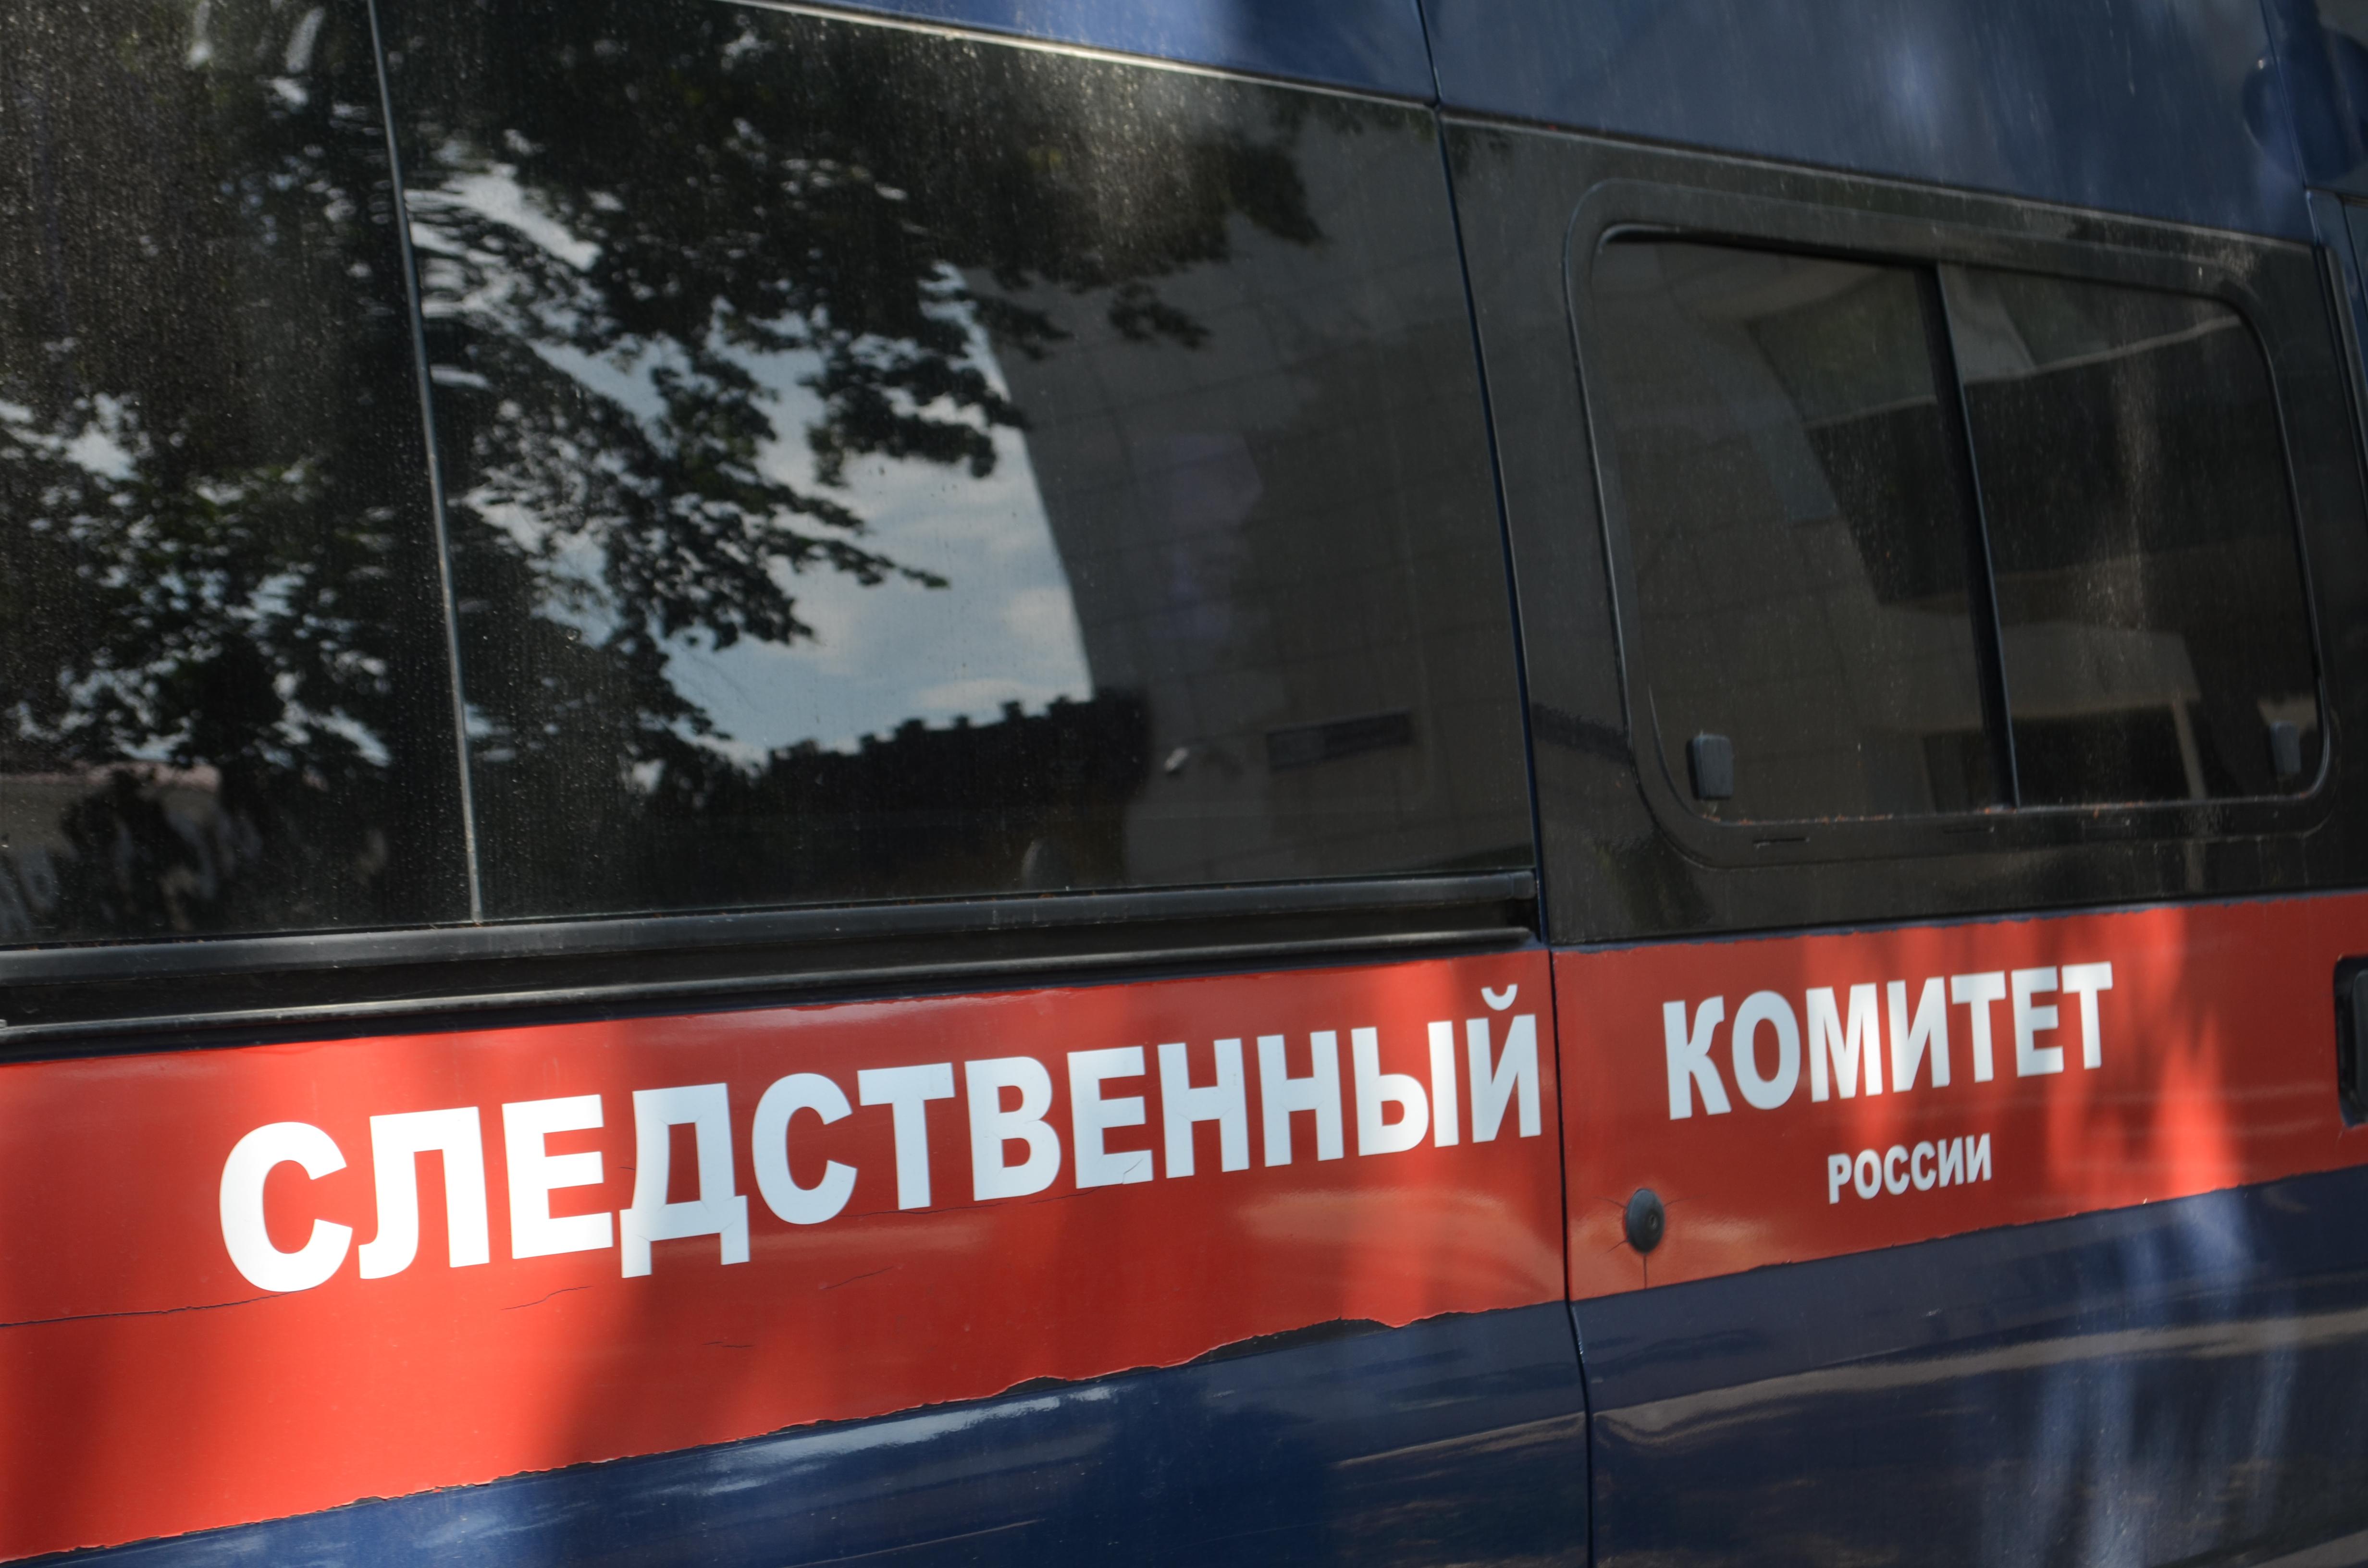 «Последний звонок»: забитый досмерти белгородец позвонил в112